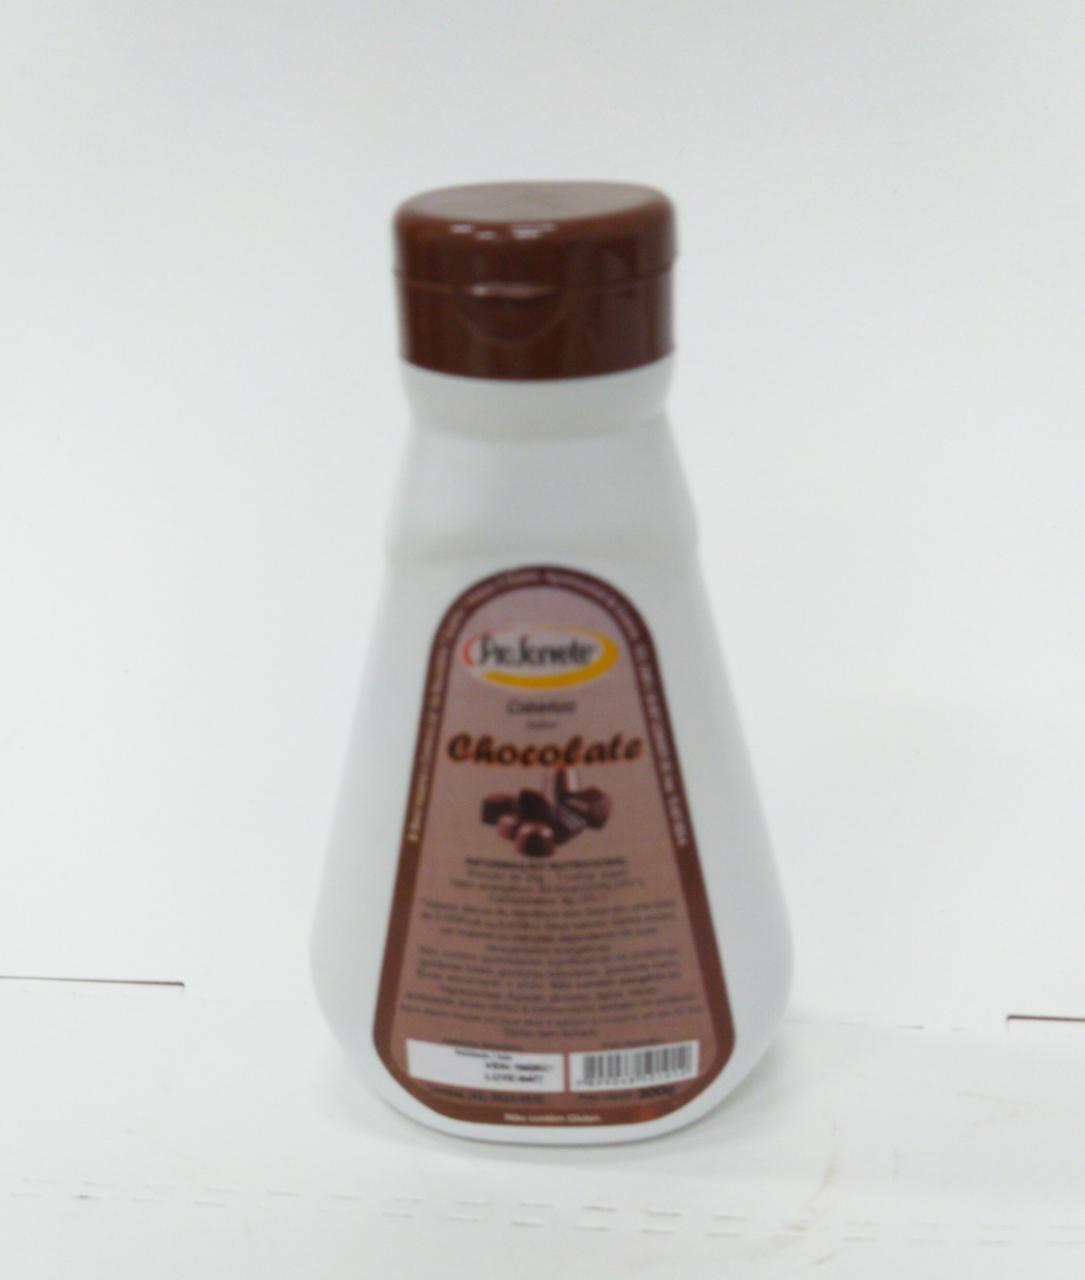 COBERTURA SABOR CHOCOLATE 300G PRO SORVETE